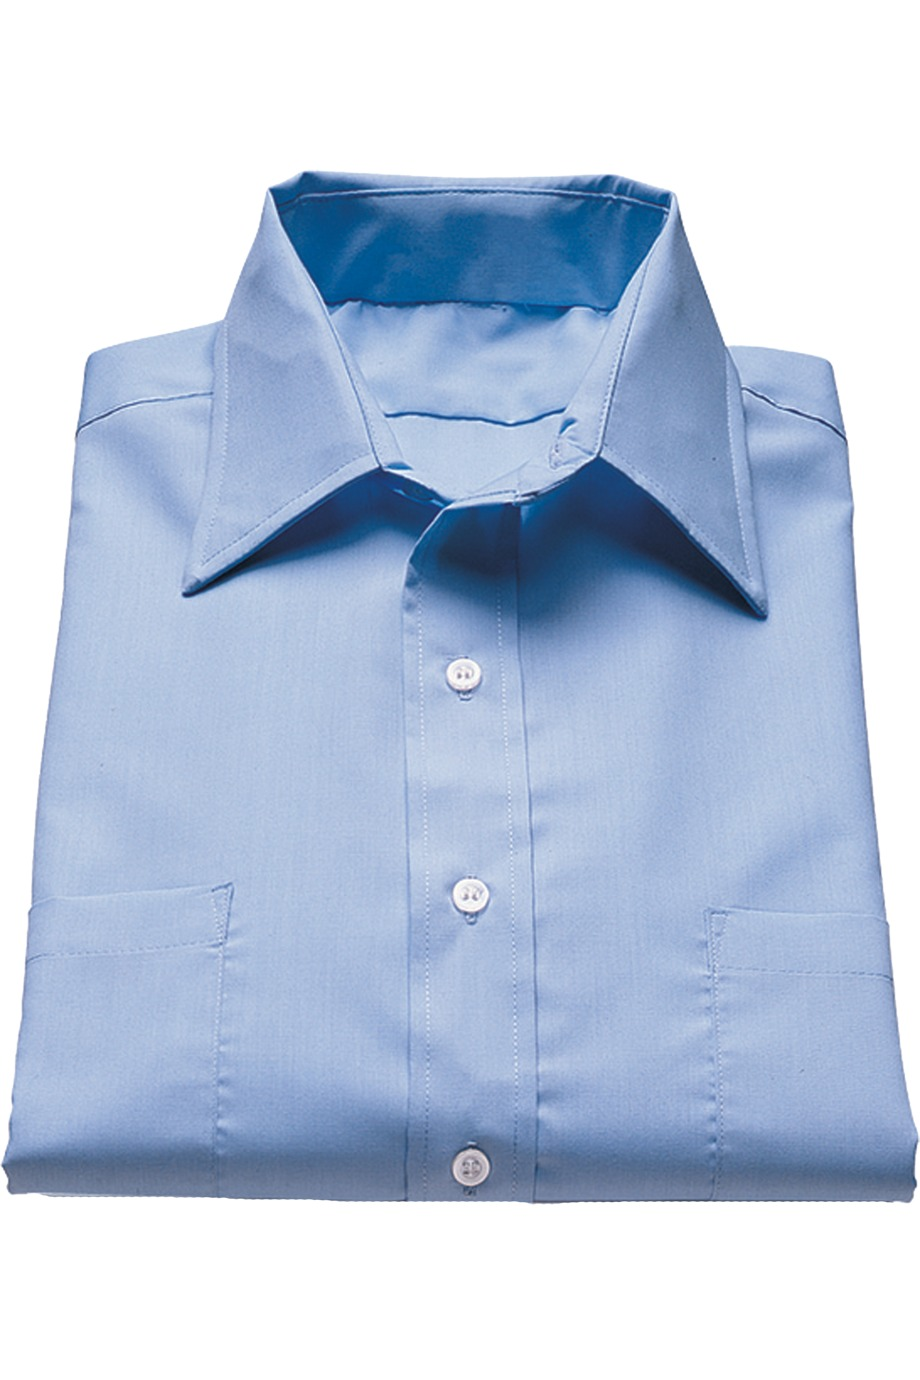 Edwards Garment 1110 - Men's Traditional Long Sleeve Broadcloth Shirt